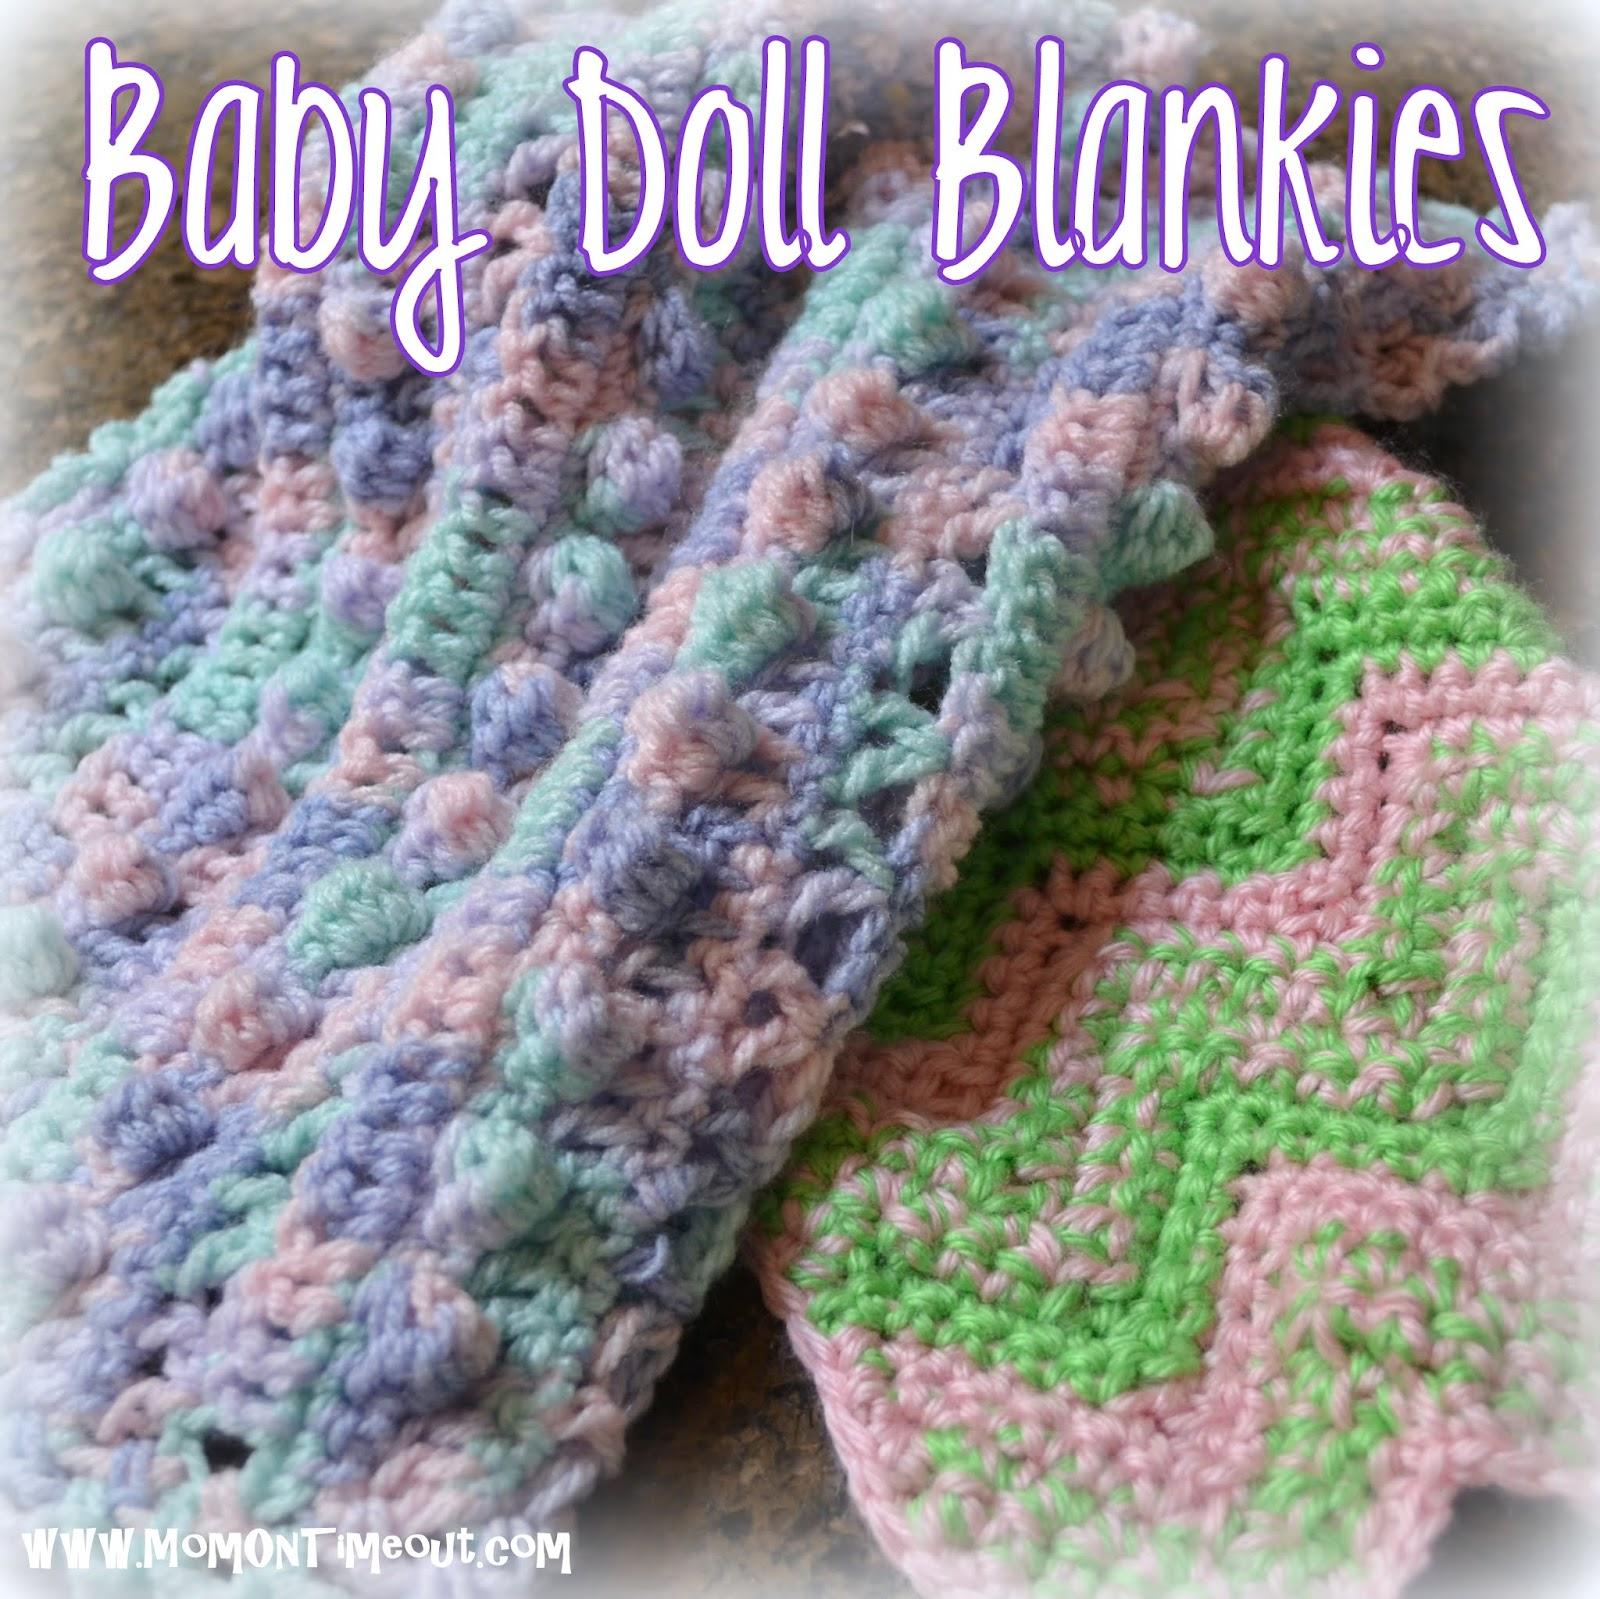 Crochet Hook Size Q Blankets